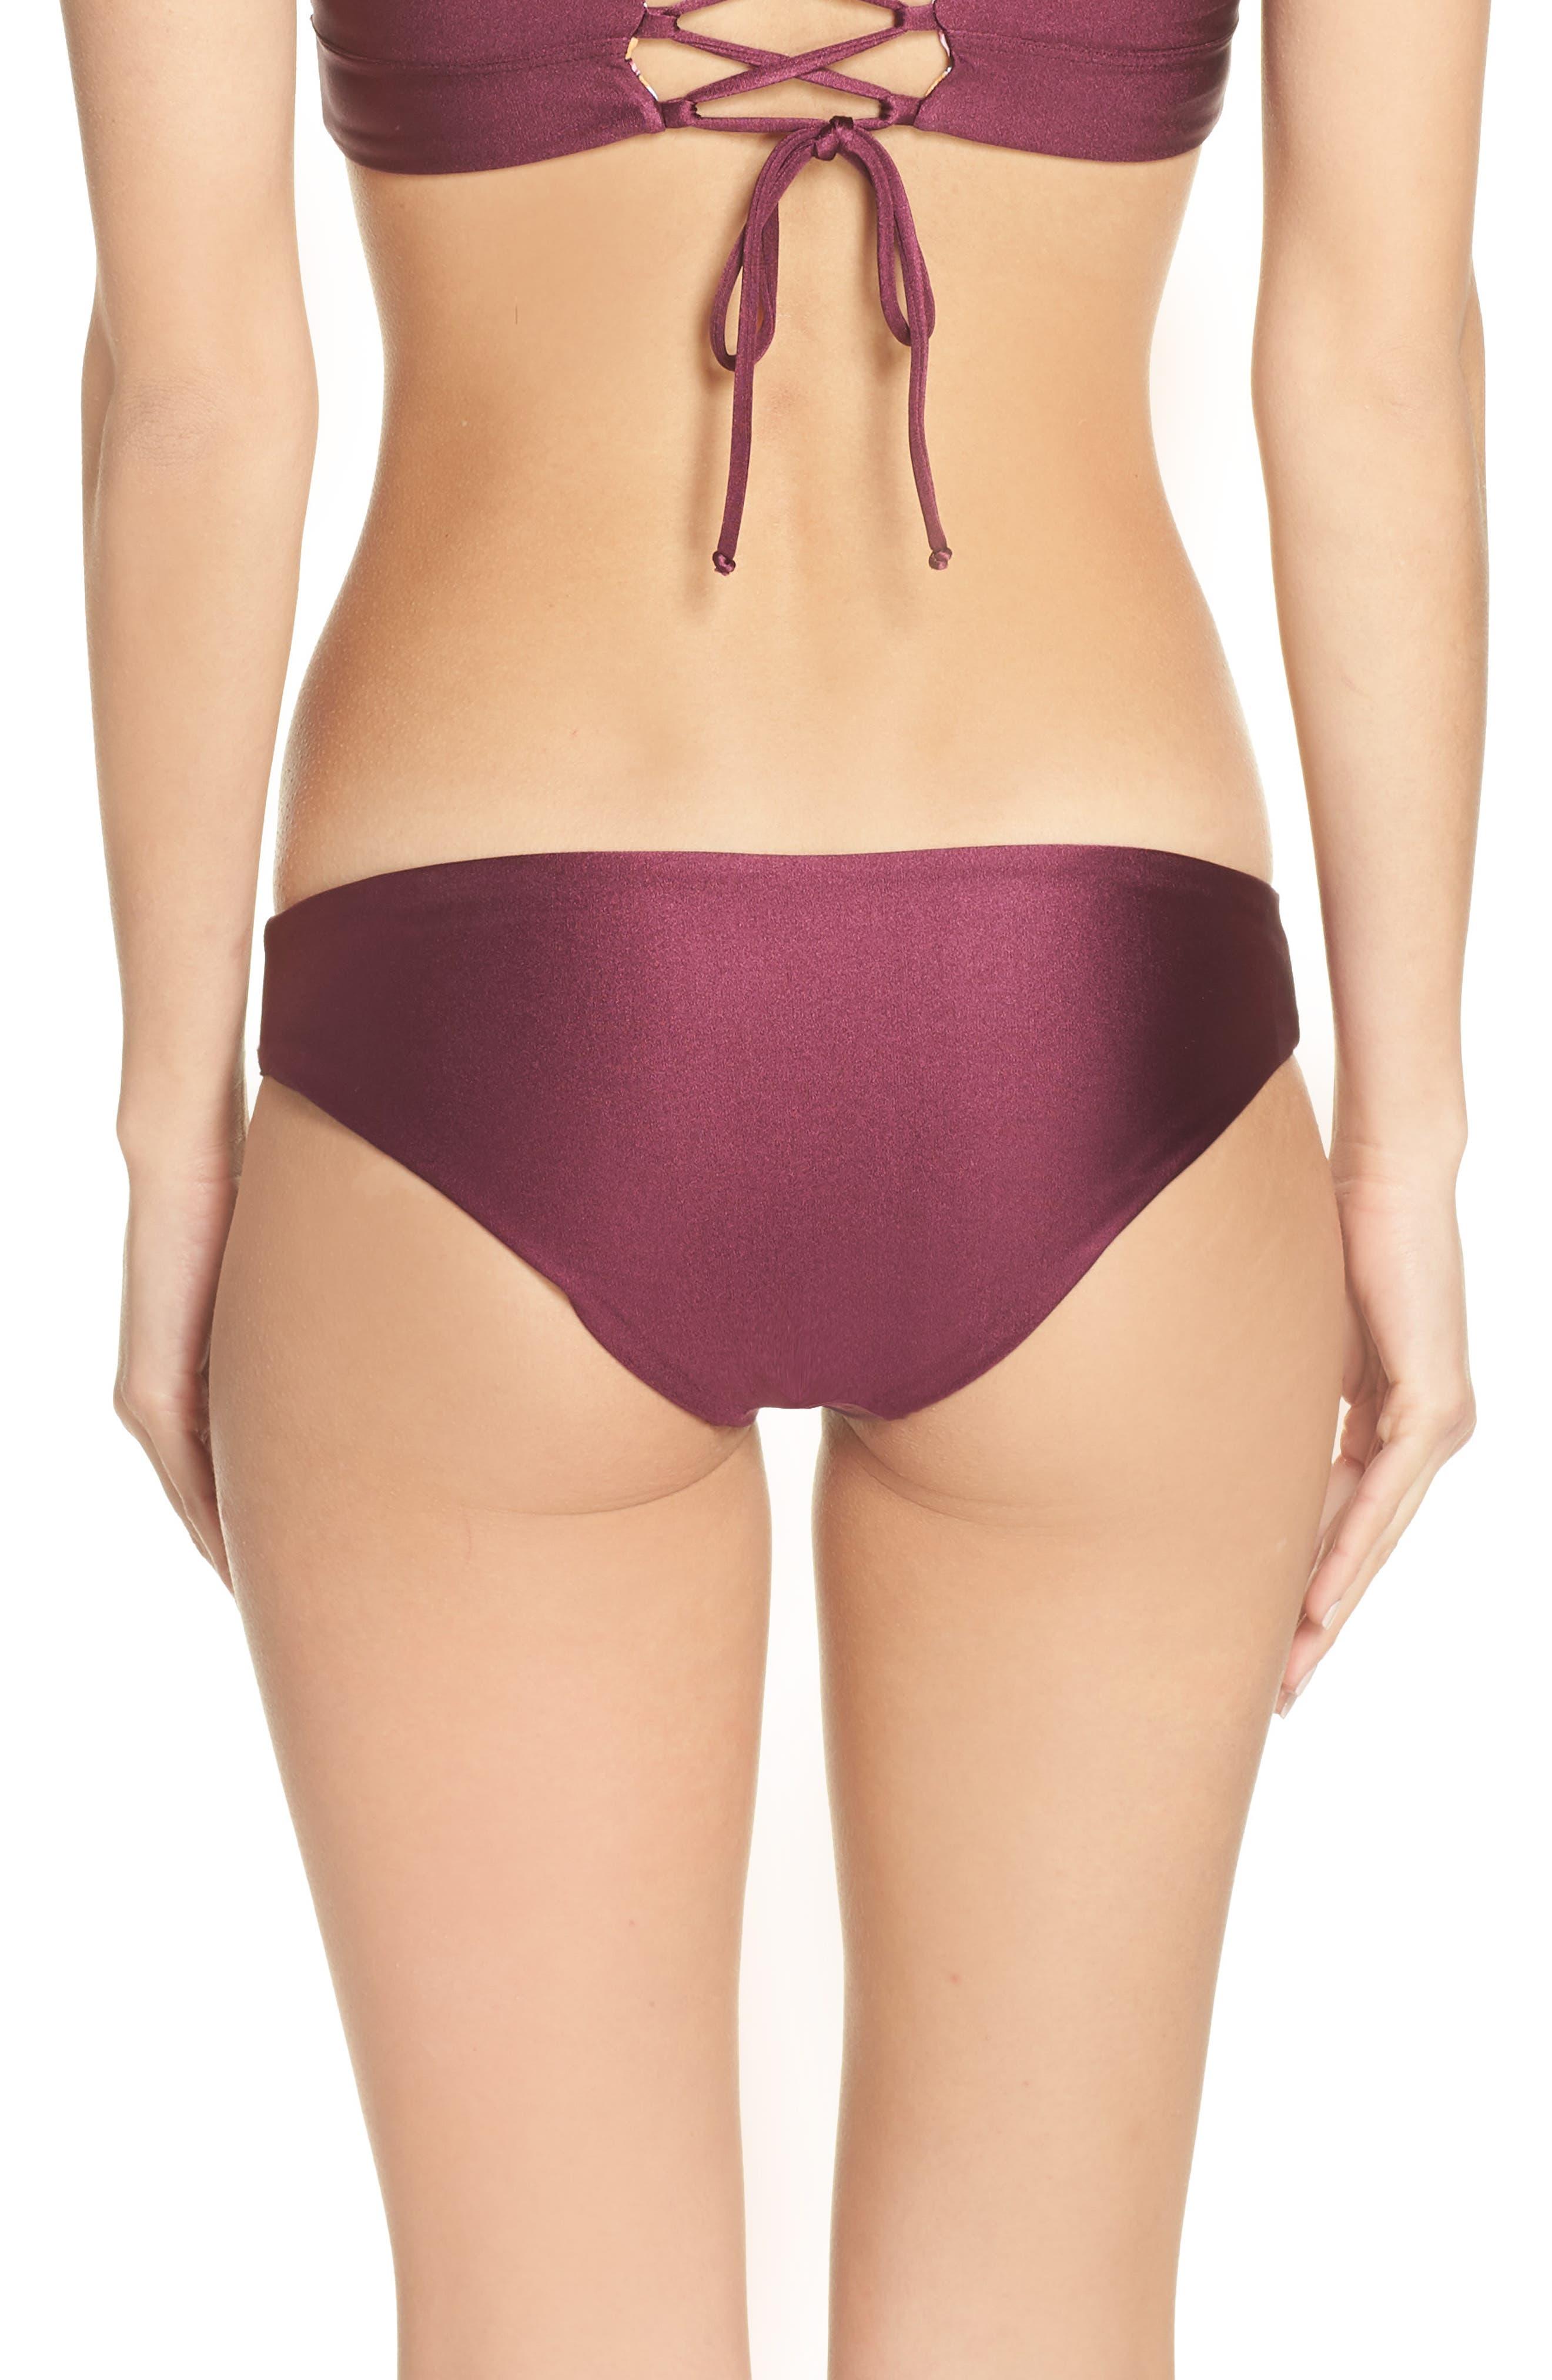 Beach Plum Sublime Reversible Bikini Bottoms,                             Alternate thumbnail 3, color,                             BEACH PLUM